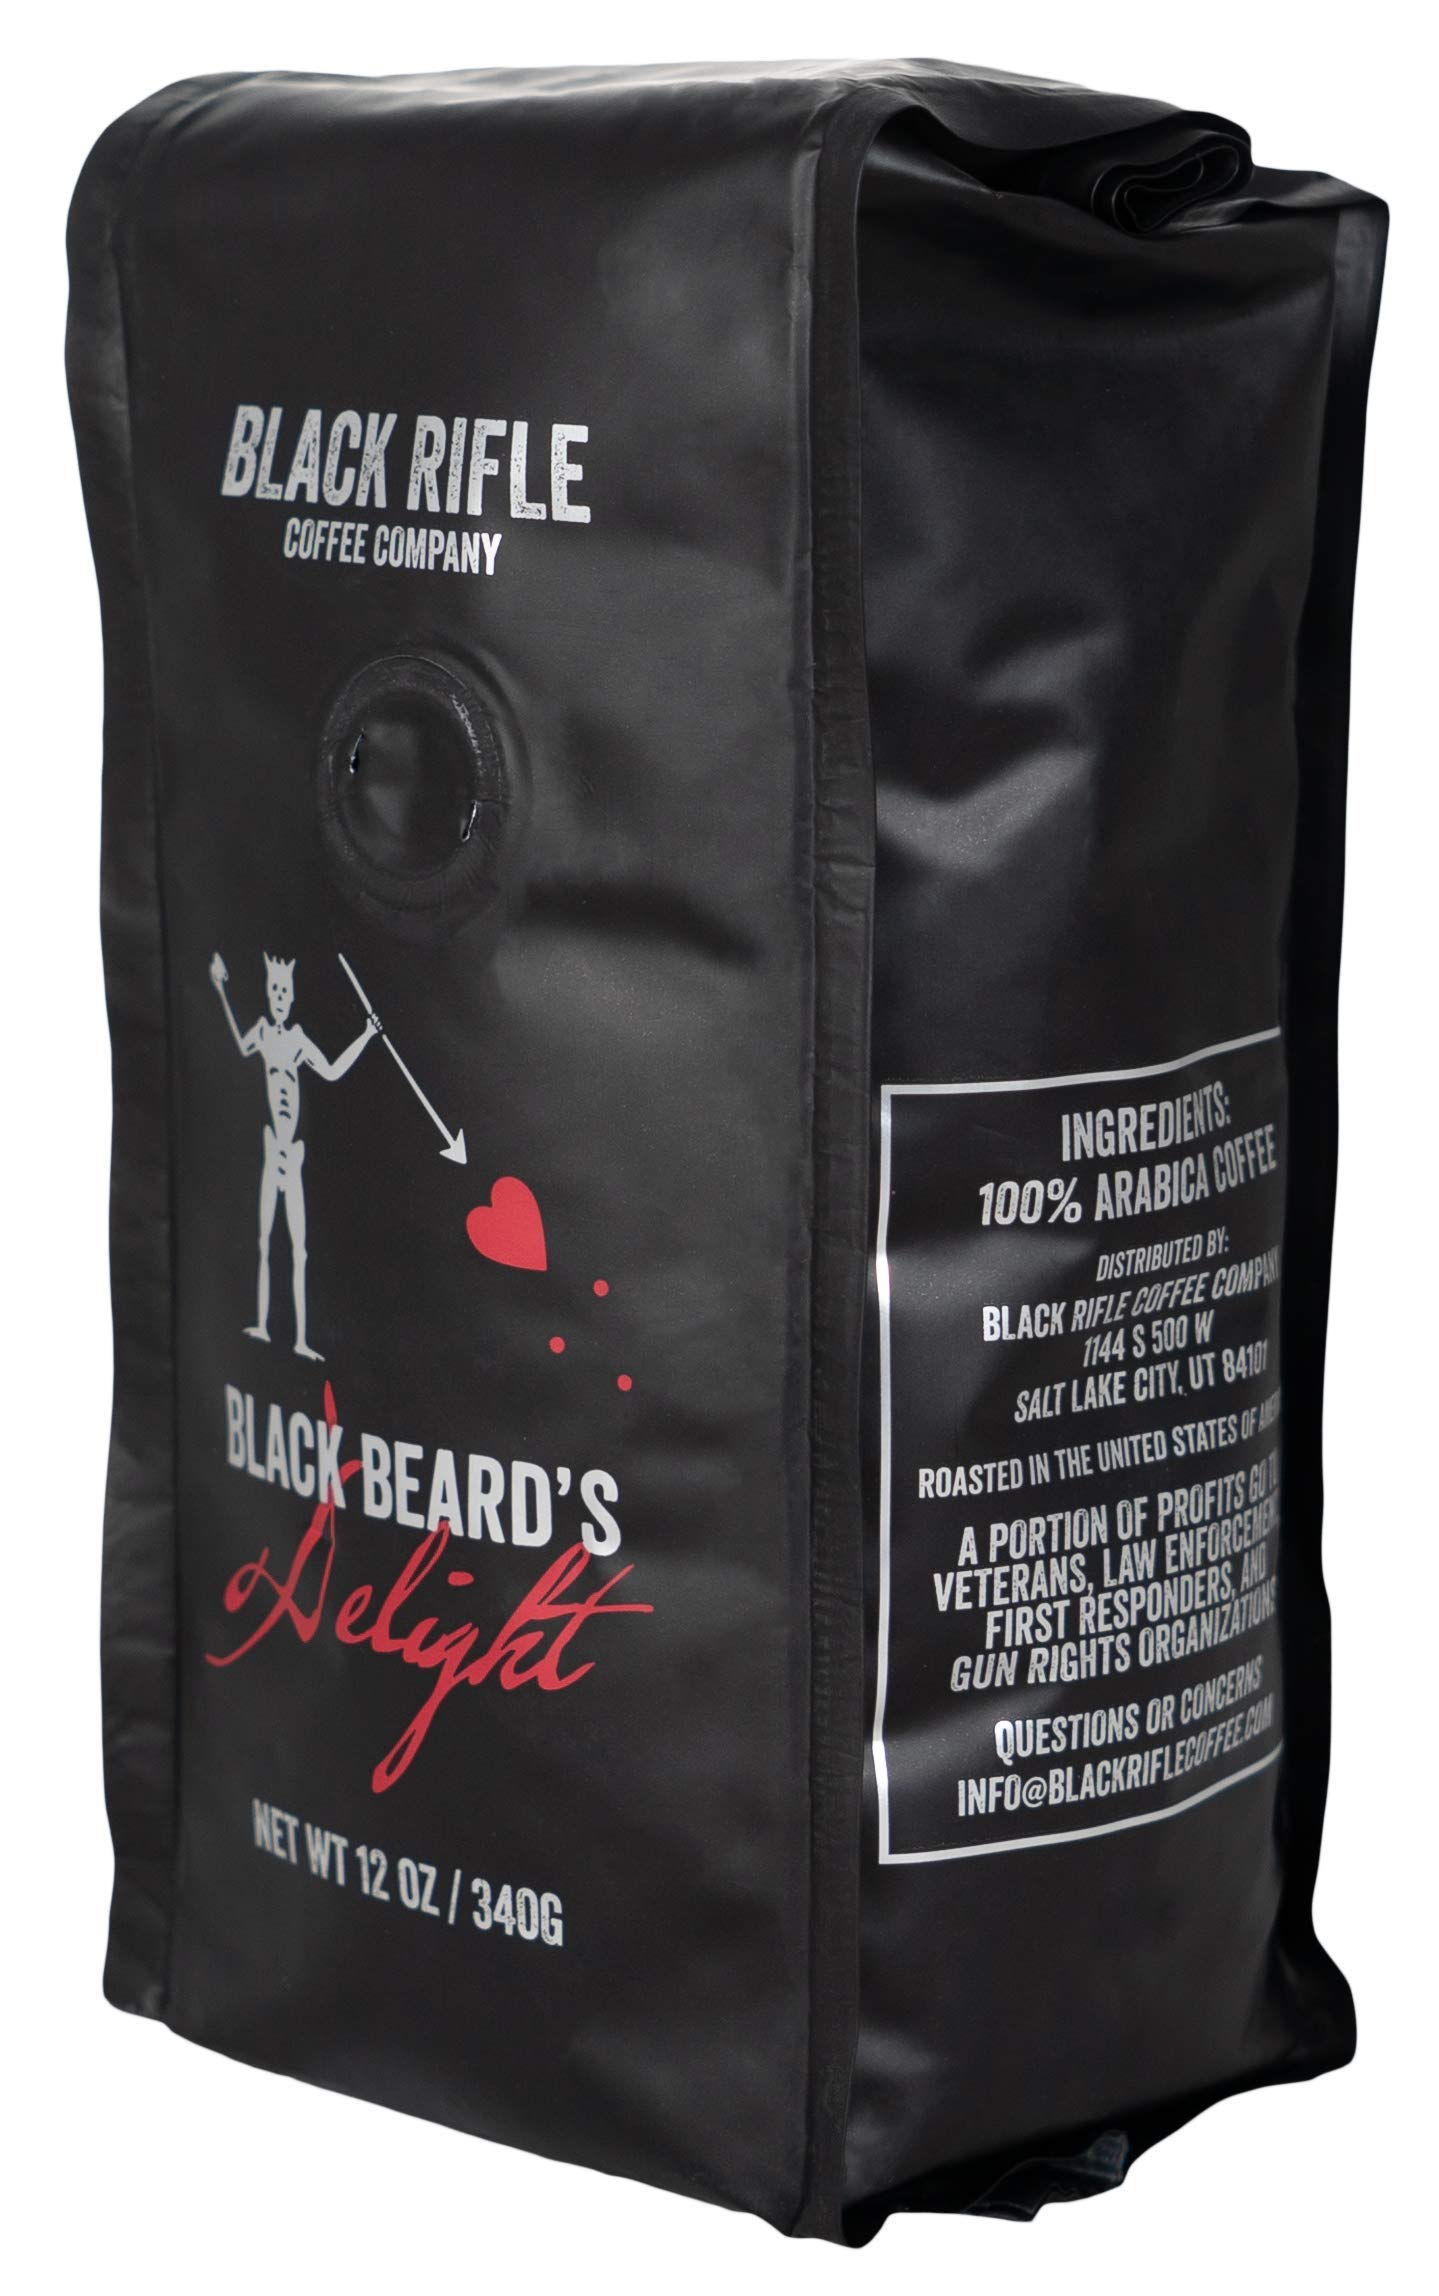 Black Rifle Coffee Company Blackbeard's Delight Coffee Dark Roast Ground, 12 Ounce Bag by Black Rifle Coffee Company (Image #1)